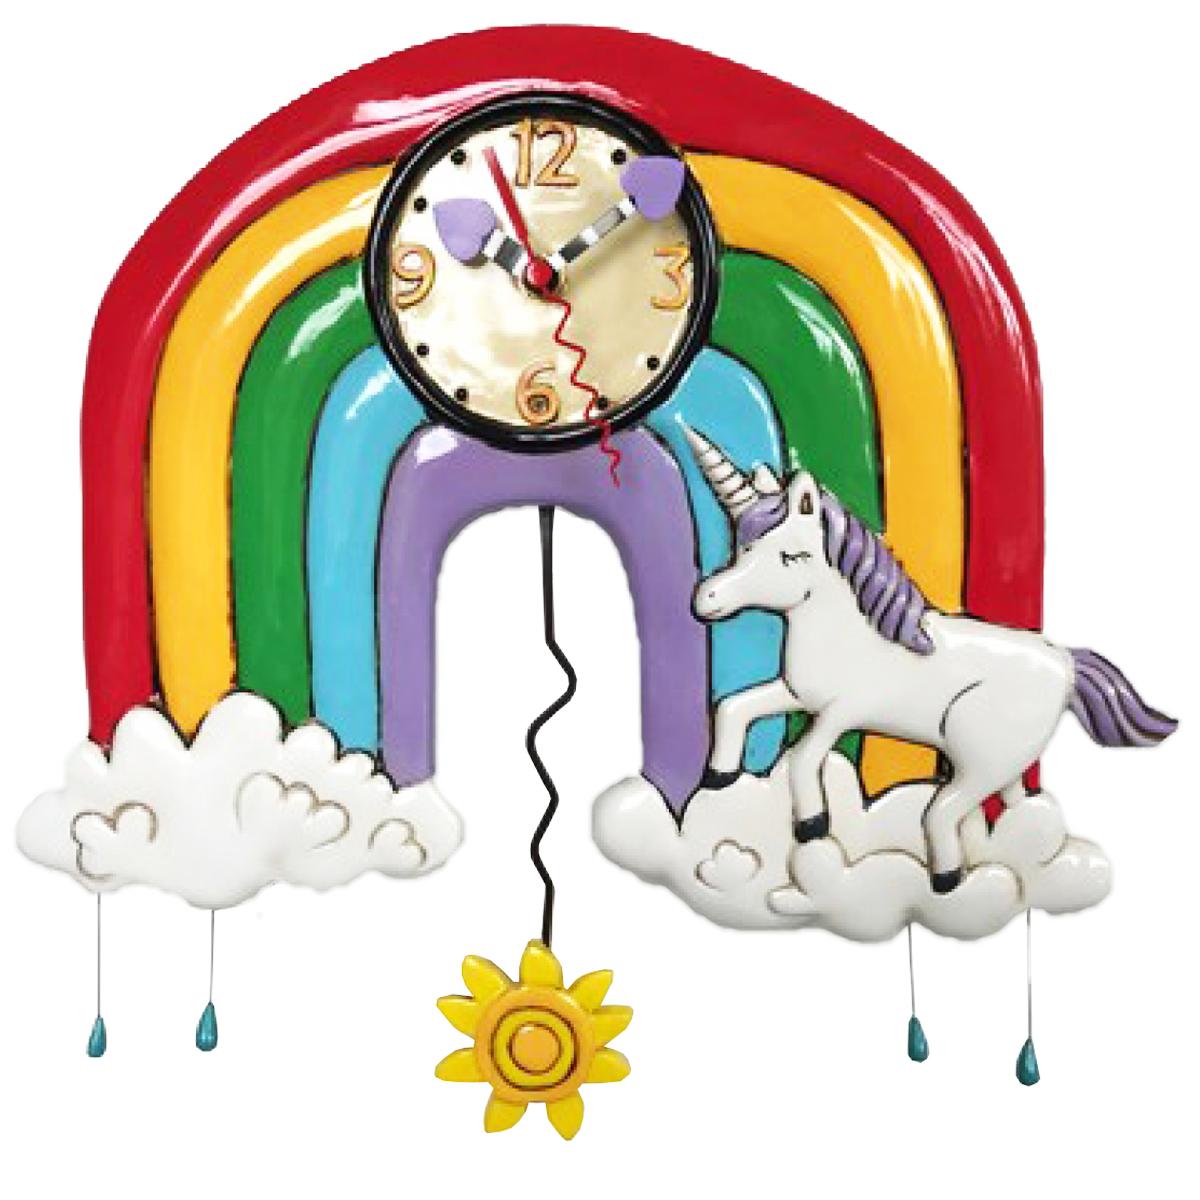 Horloge Murale \'Allen Designs\' multicolore (licorne arc en ciel) - 32x28 cm - [Q1994]